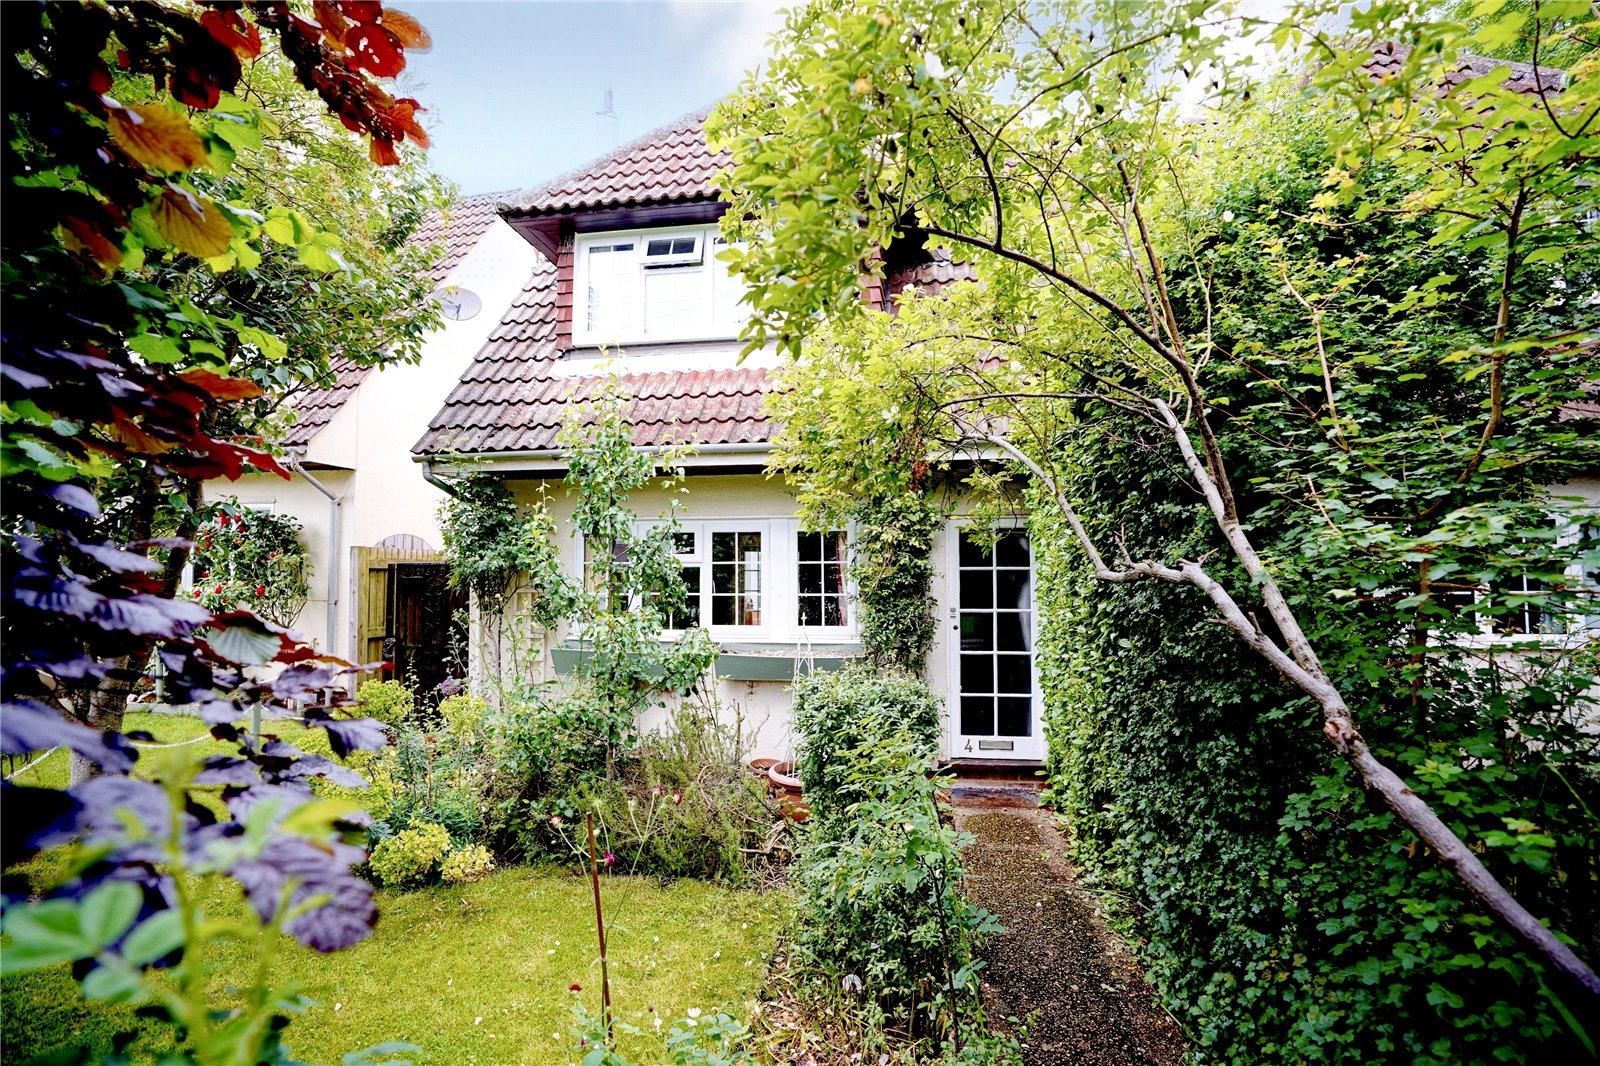 3 bed house for sale in Hatley Road, Wrestlingworth  - Property Image 1